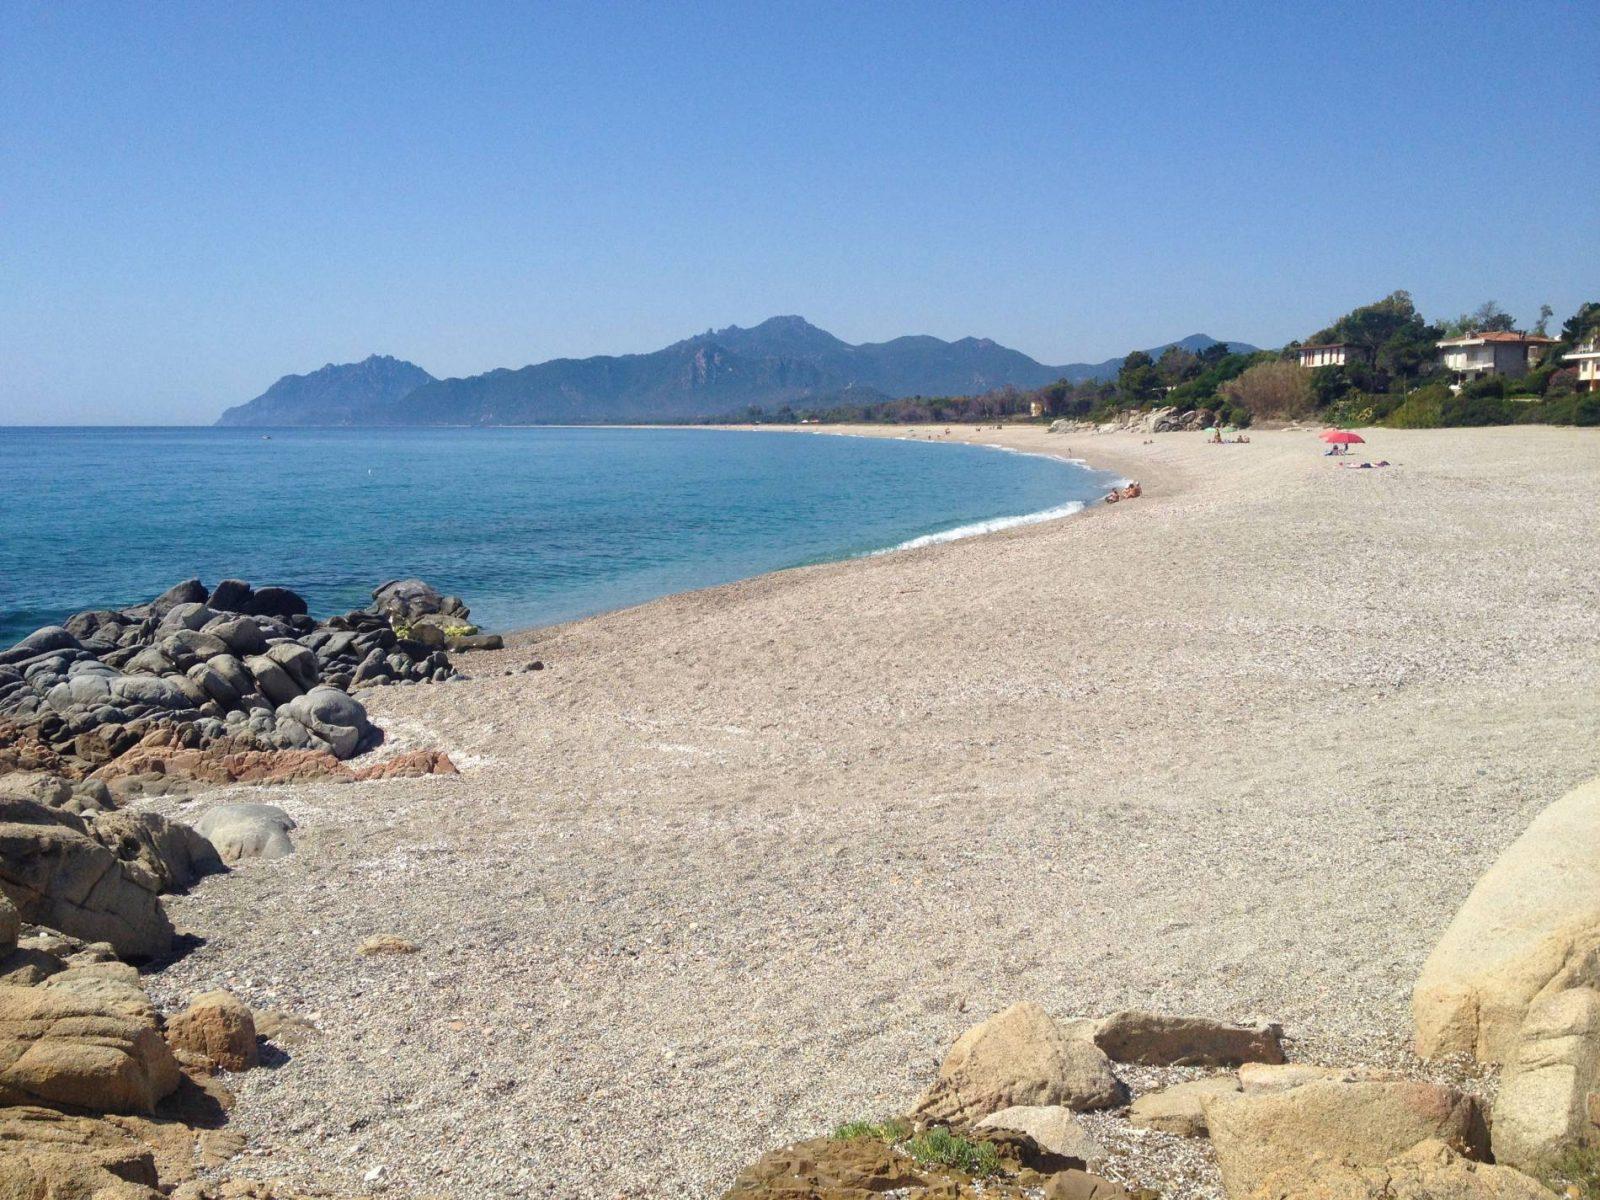 Spiaggia di Planargia